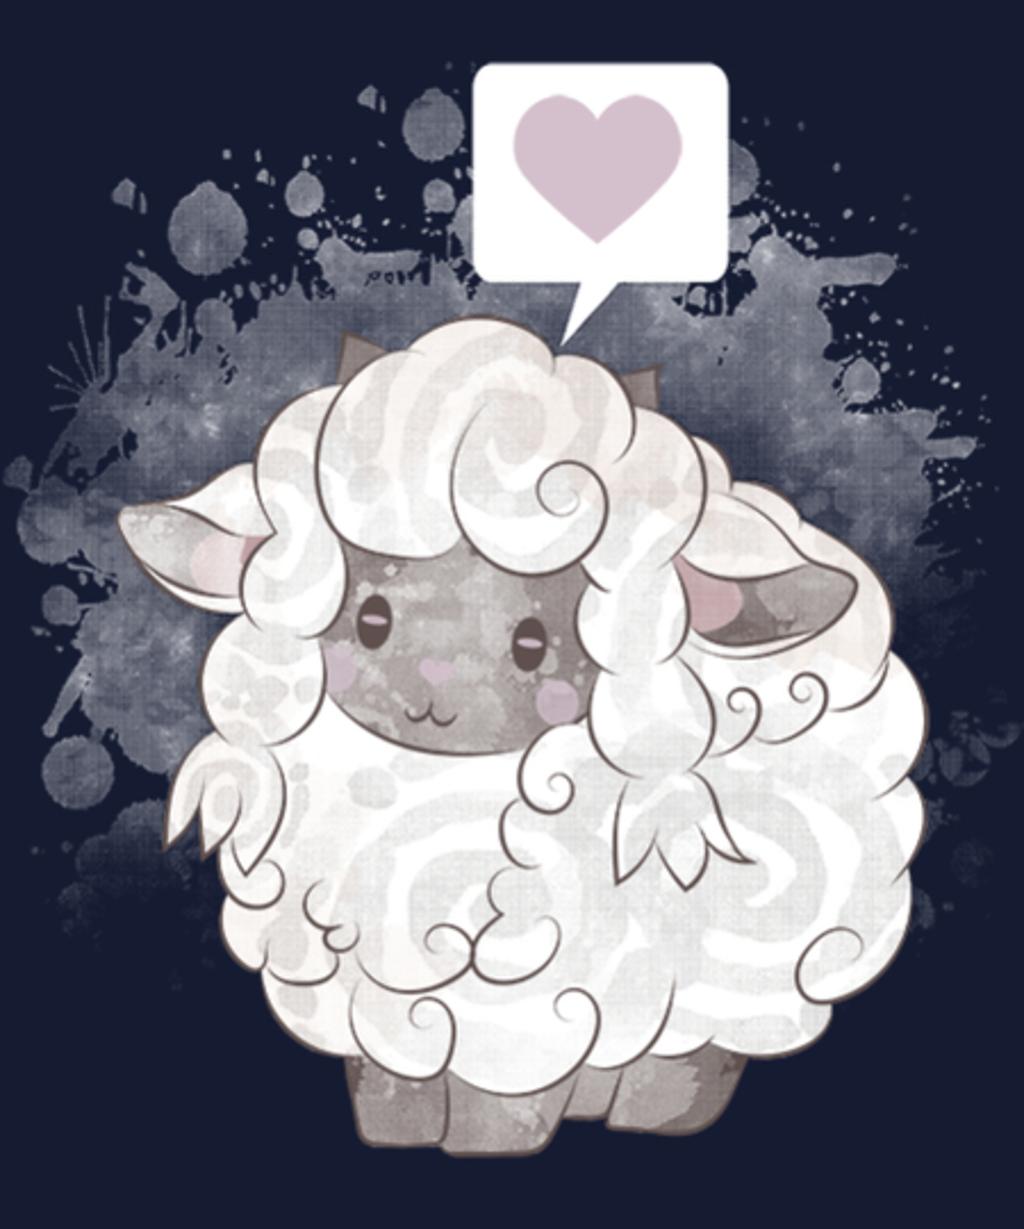 Qwertee: Cute WooLoo